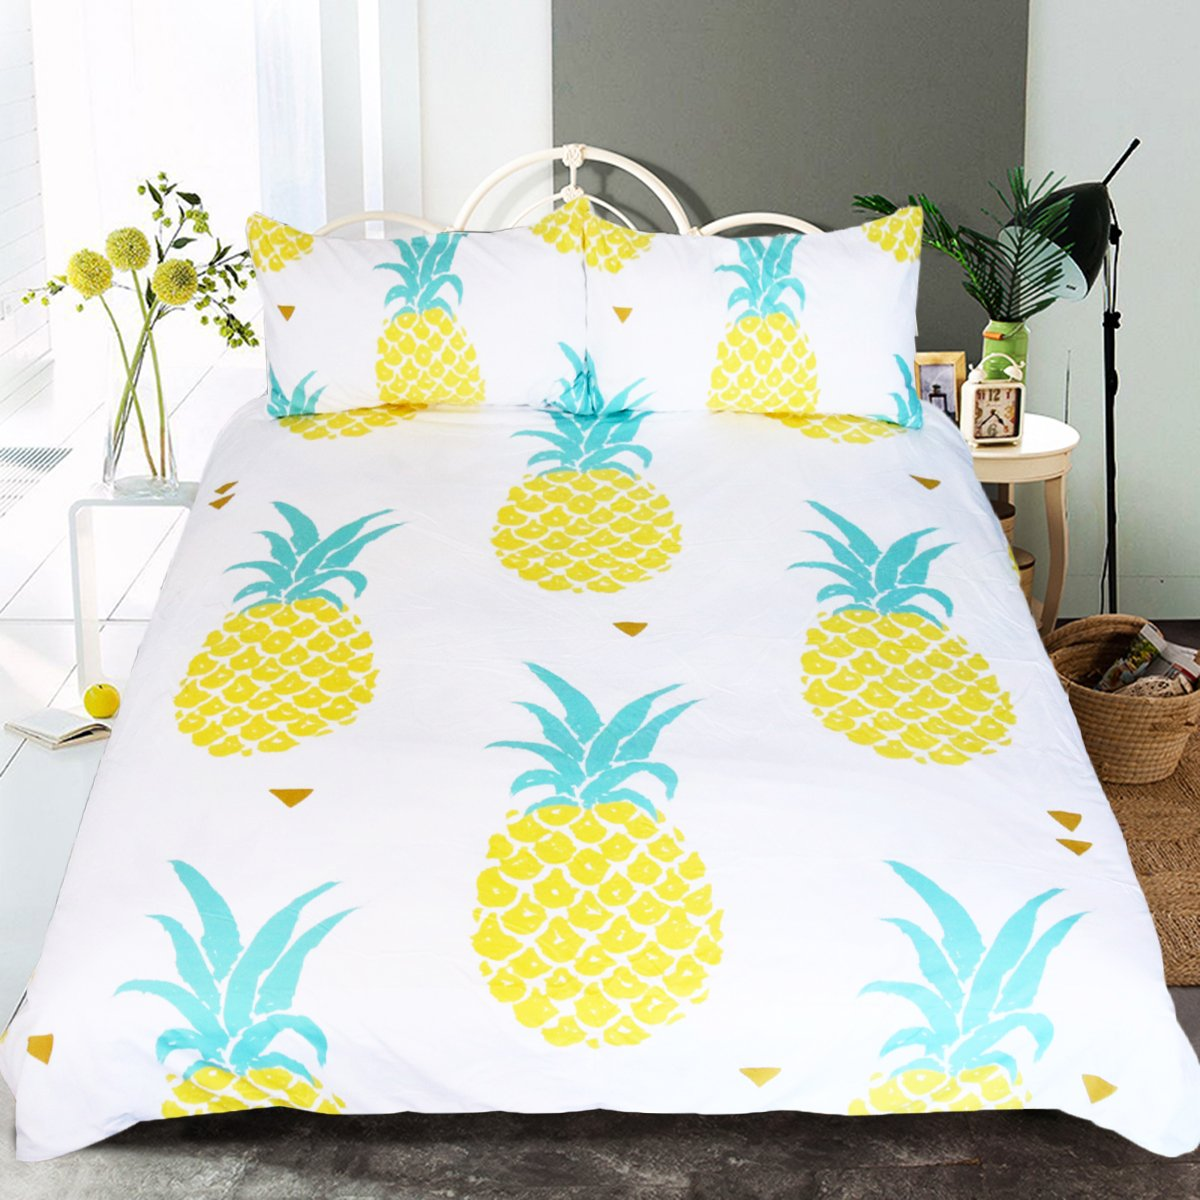 Adults Sleepwish Piece for ツイン Tropical Bedding 3 Duvet Boys Set (Twin) Duvet Kawaii Cover (Twin) Hawaiian Print Pineapple B073VDWQ5T Pattern Girls Cover Pineapple ツイン